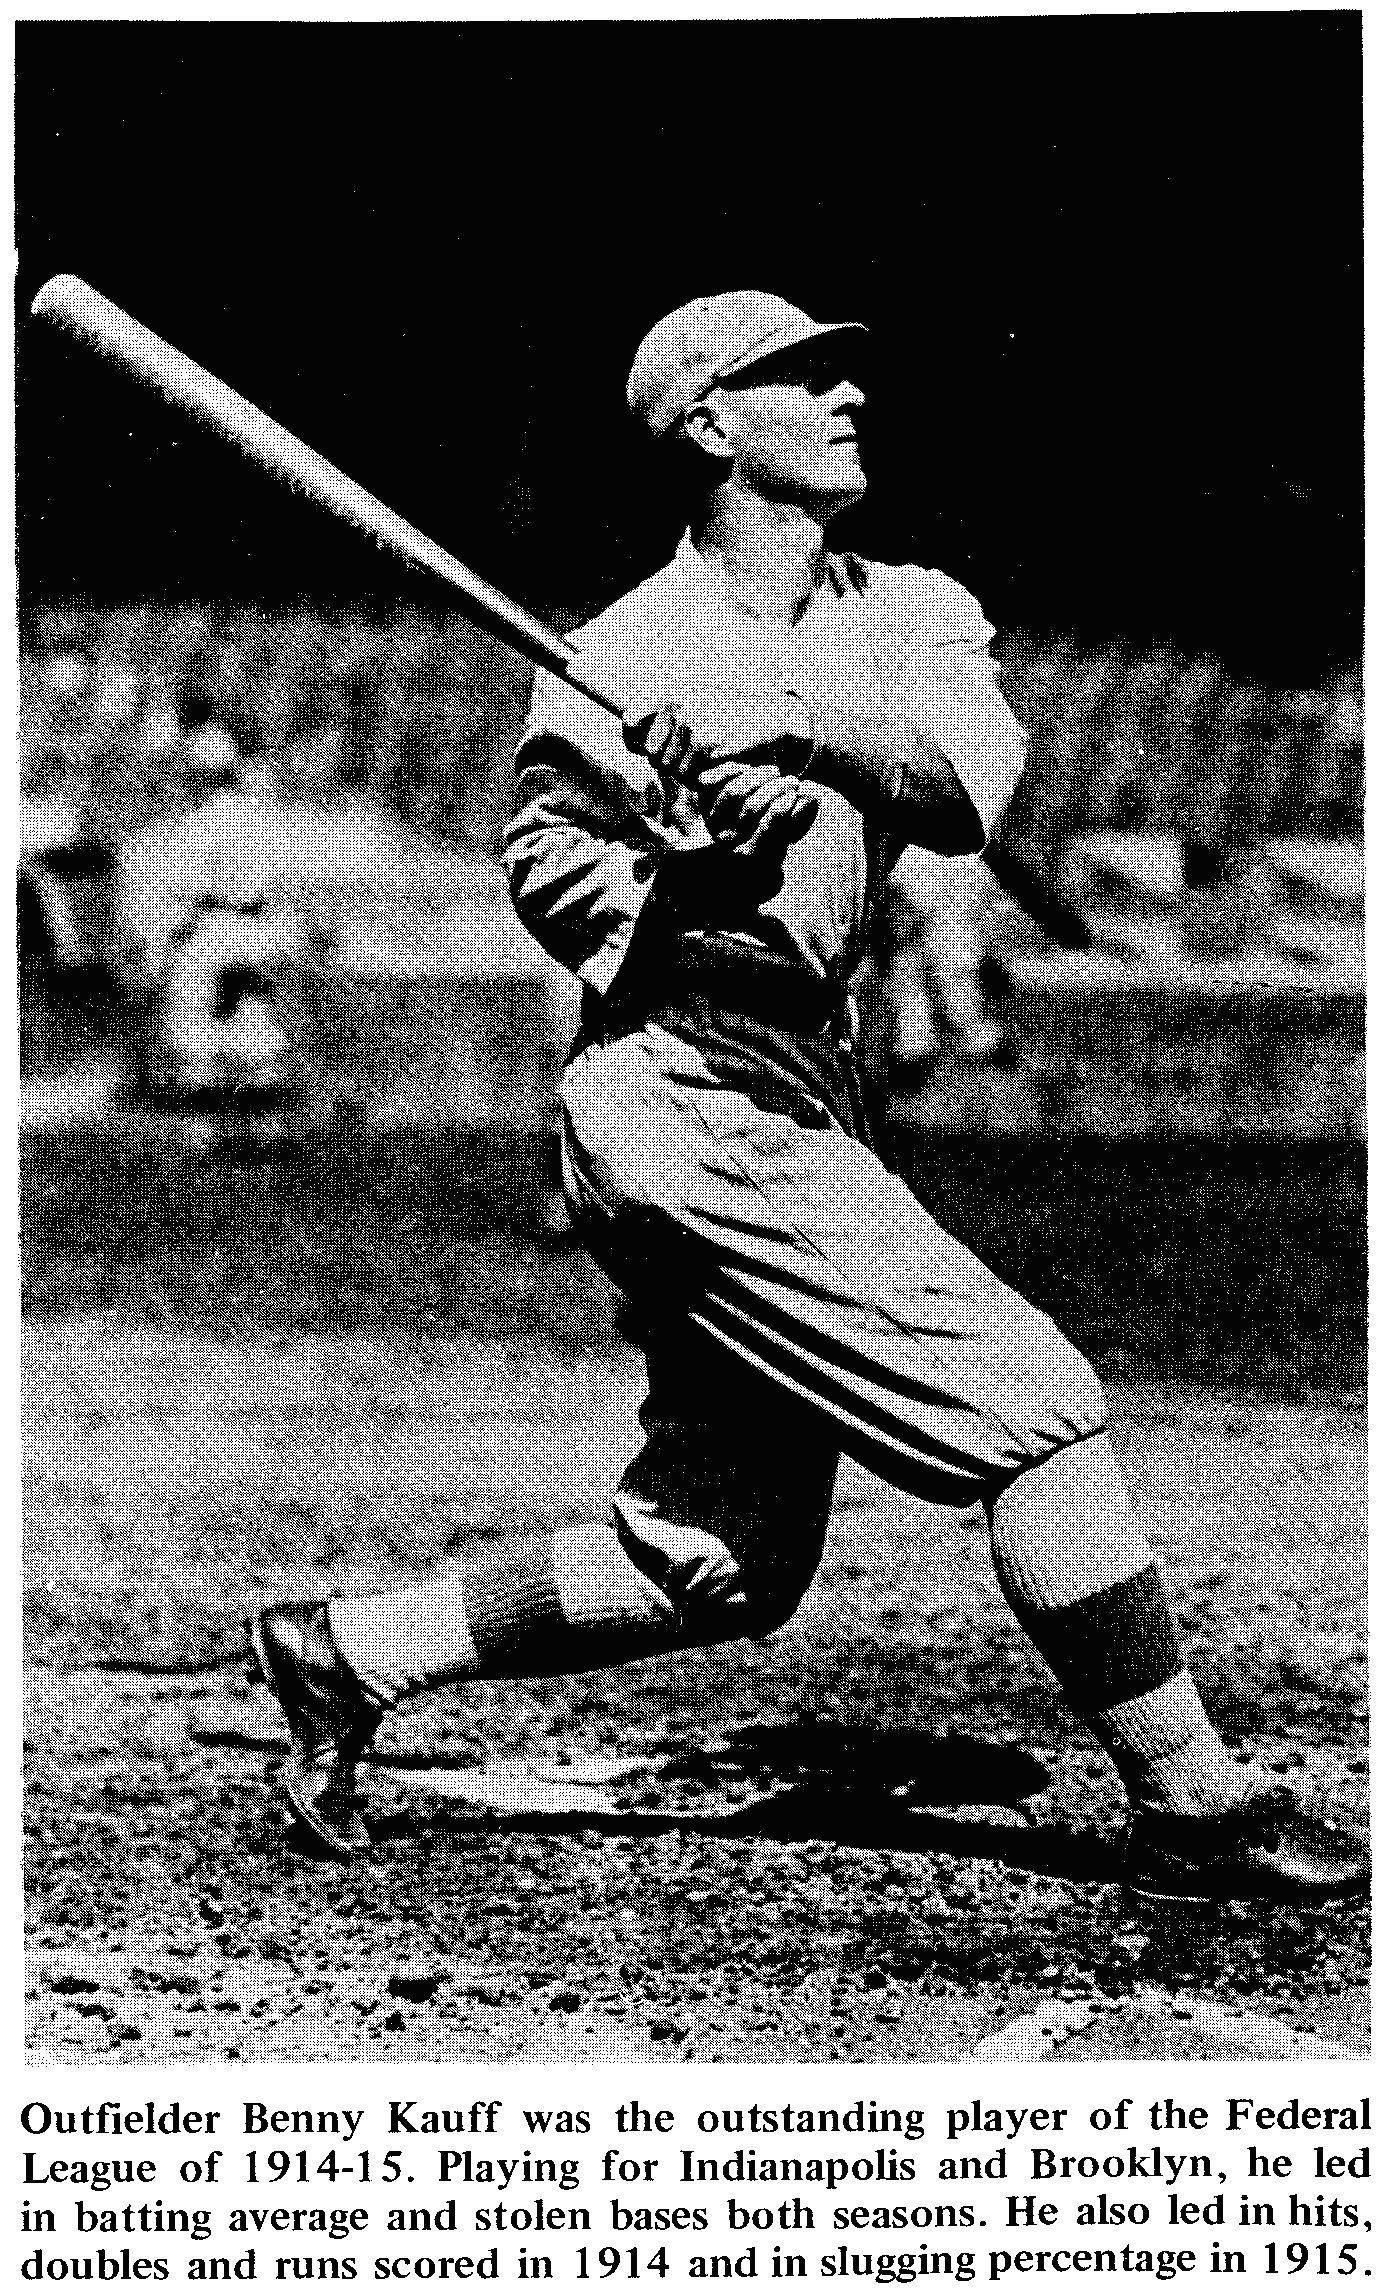 was the federal league a major league